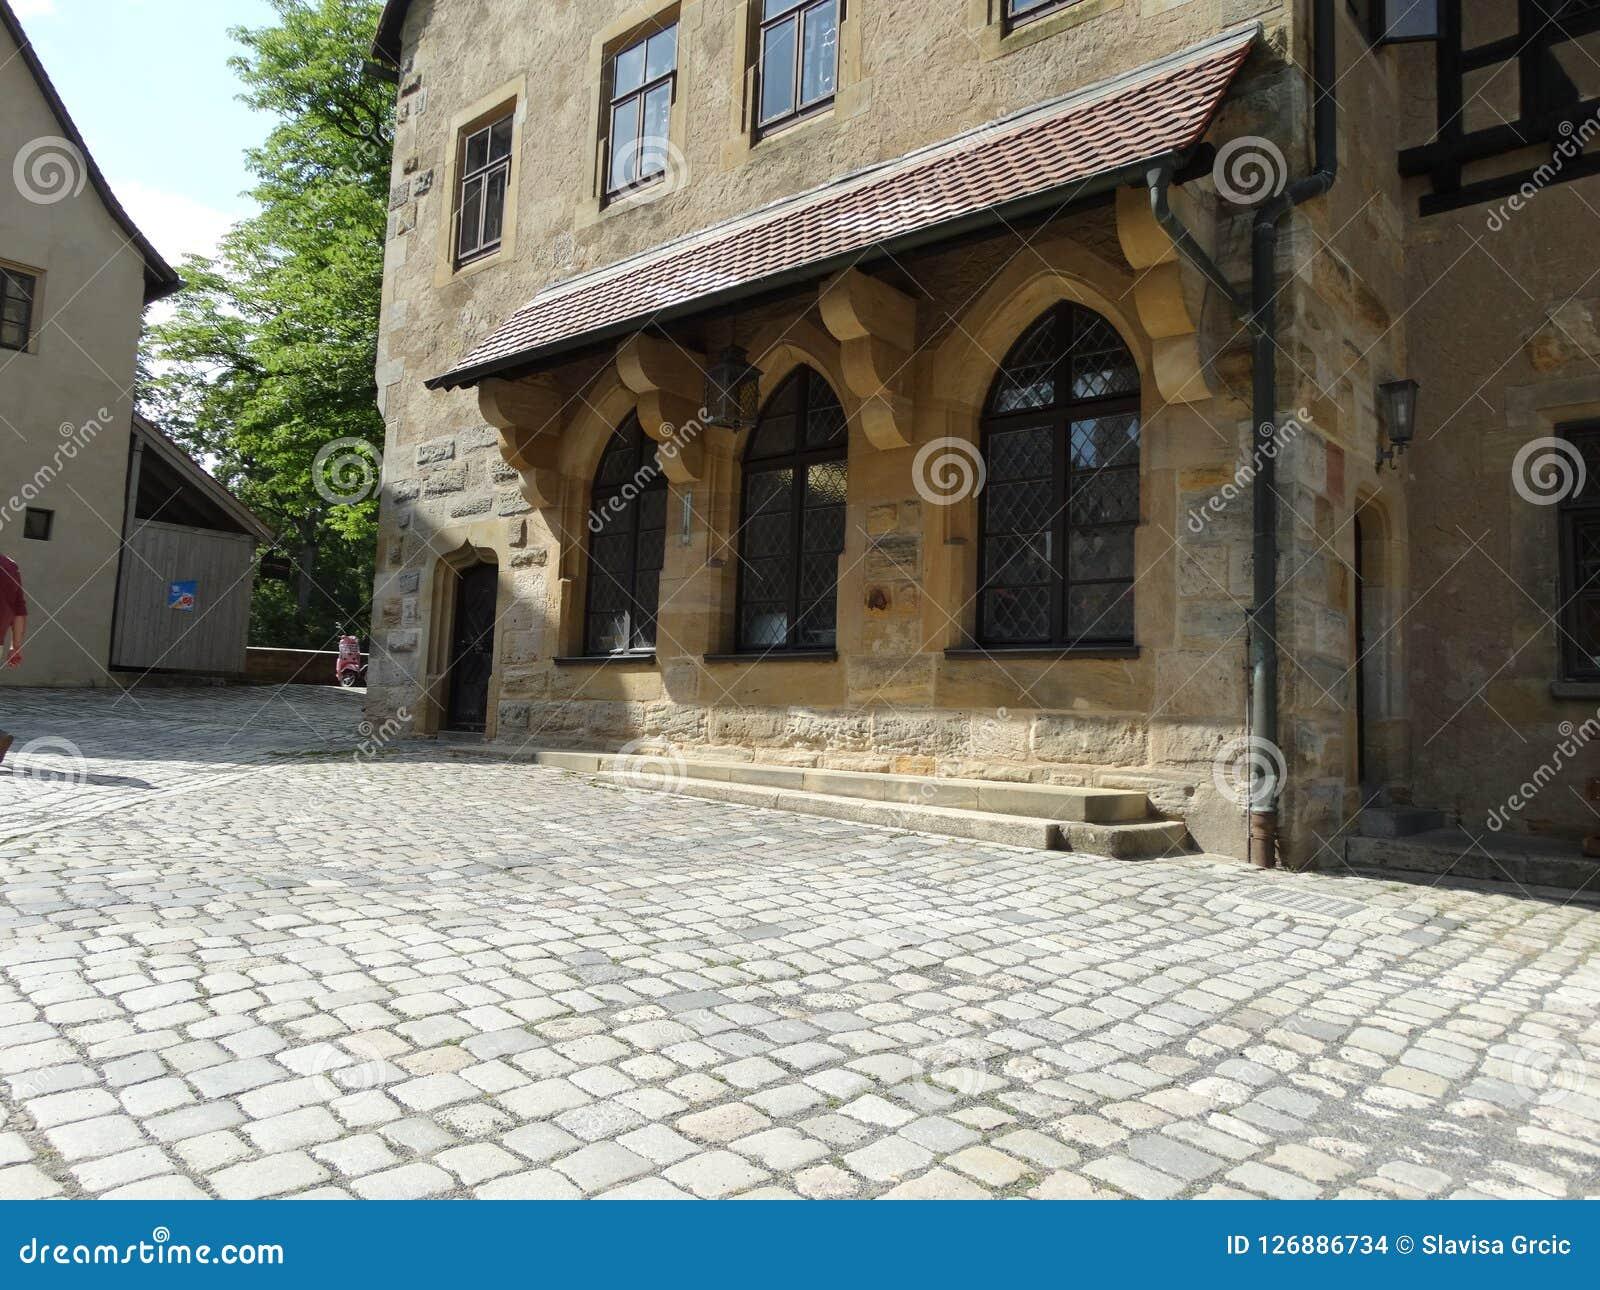 Three old windows on a stone façade